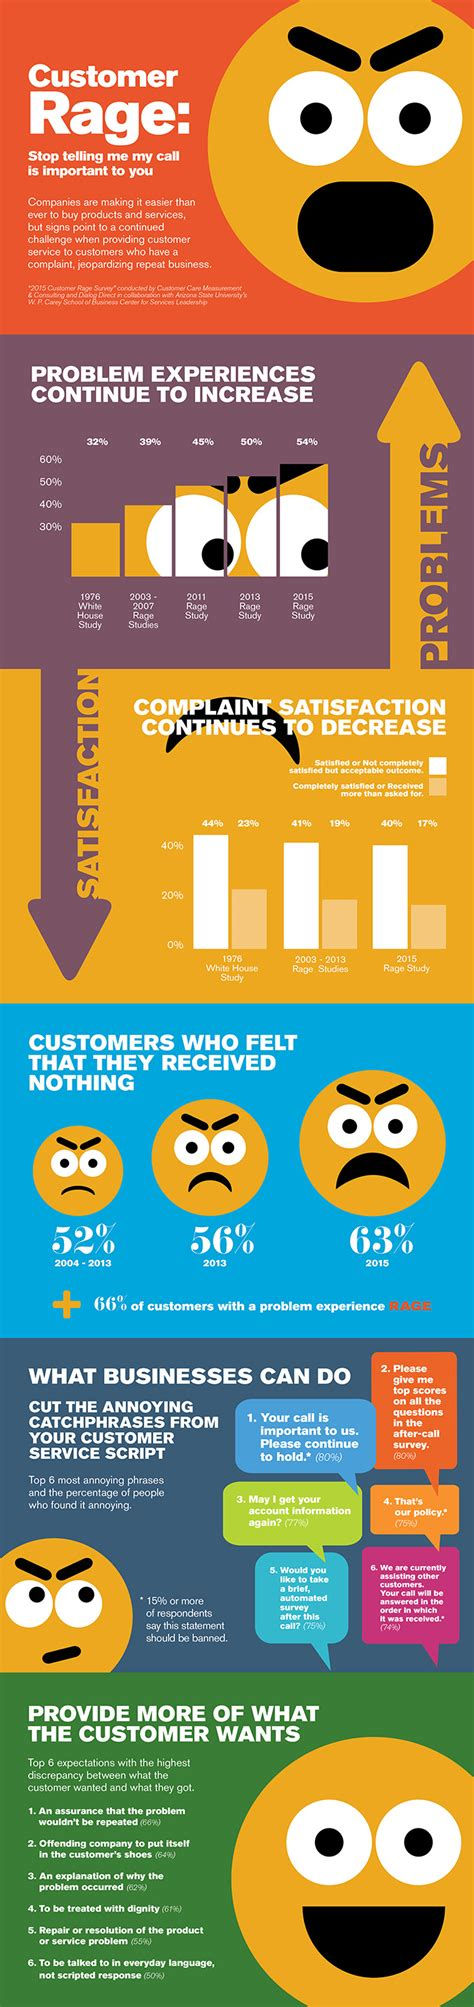 Asu Mba Worth It by Customer Rage W P Carey School Of Business